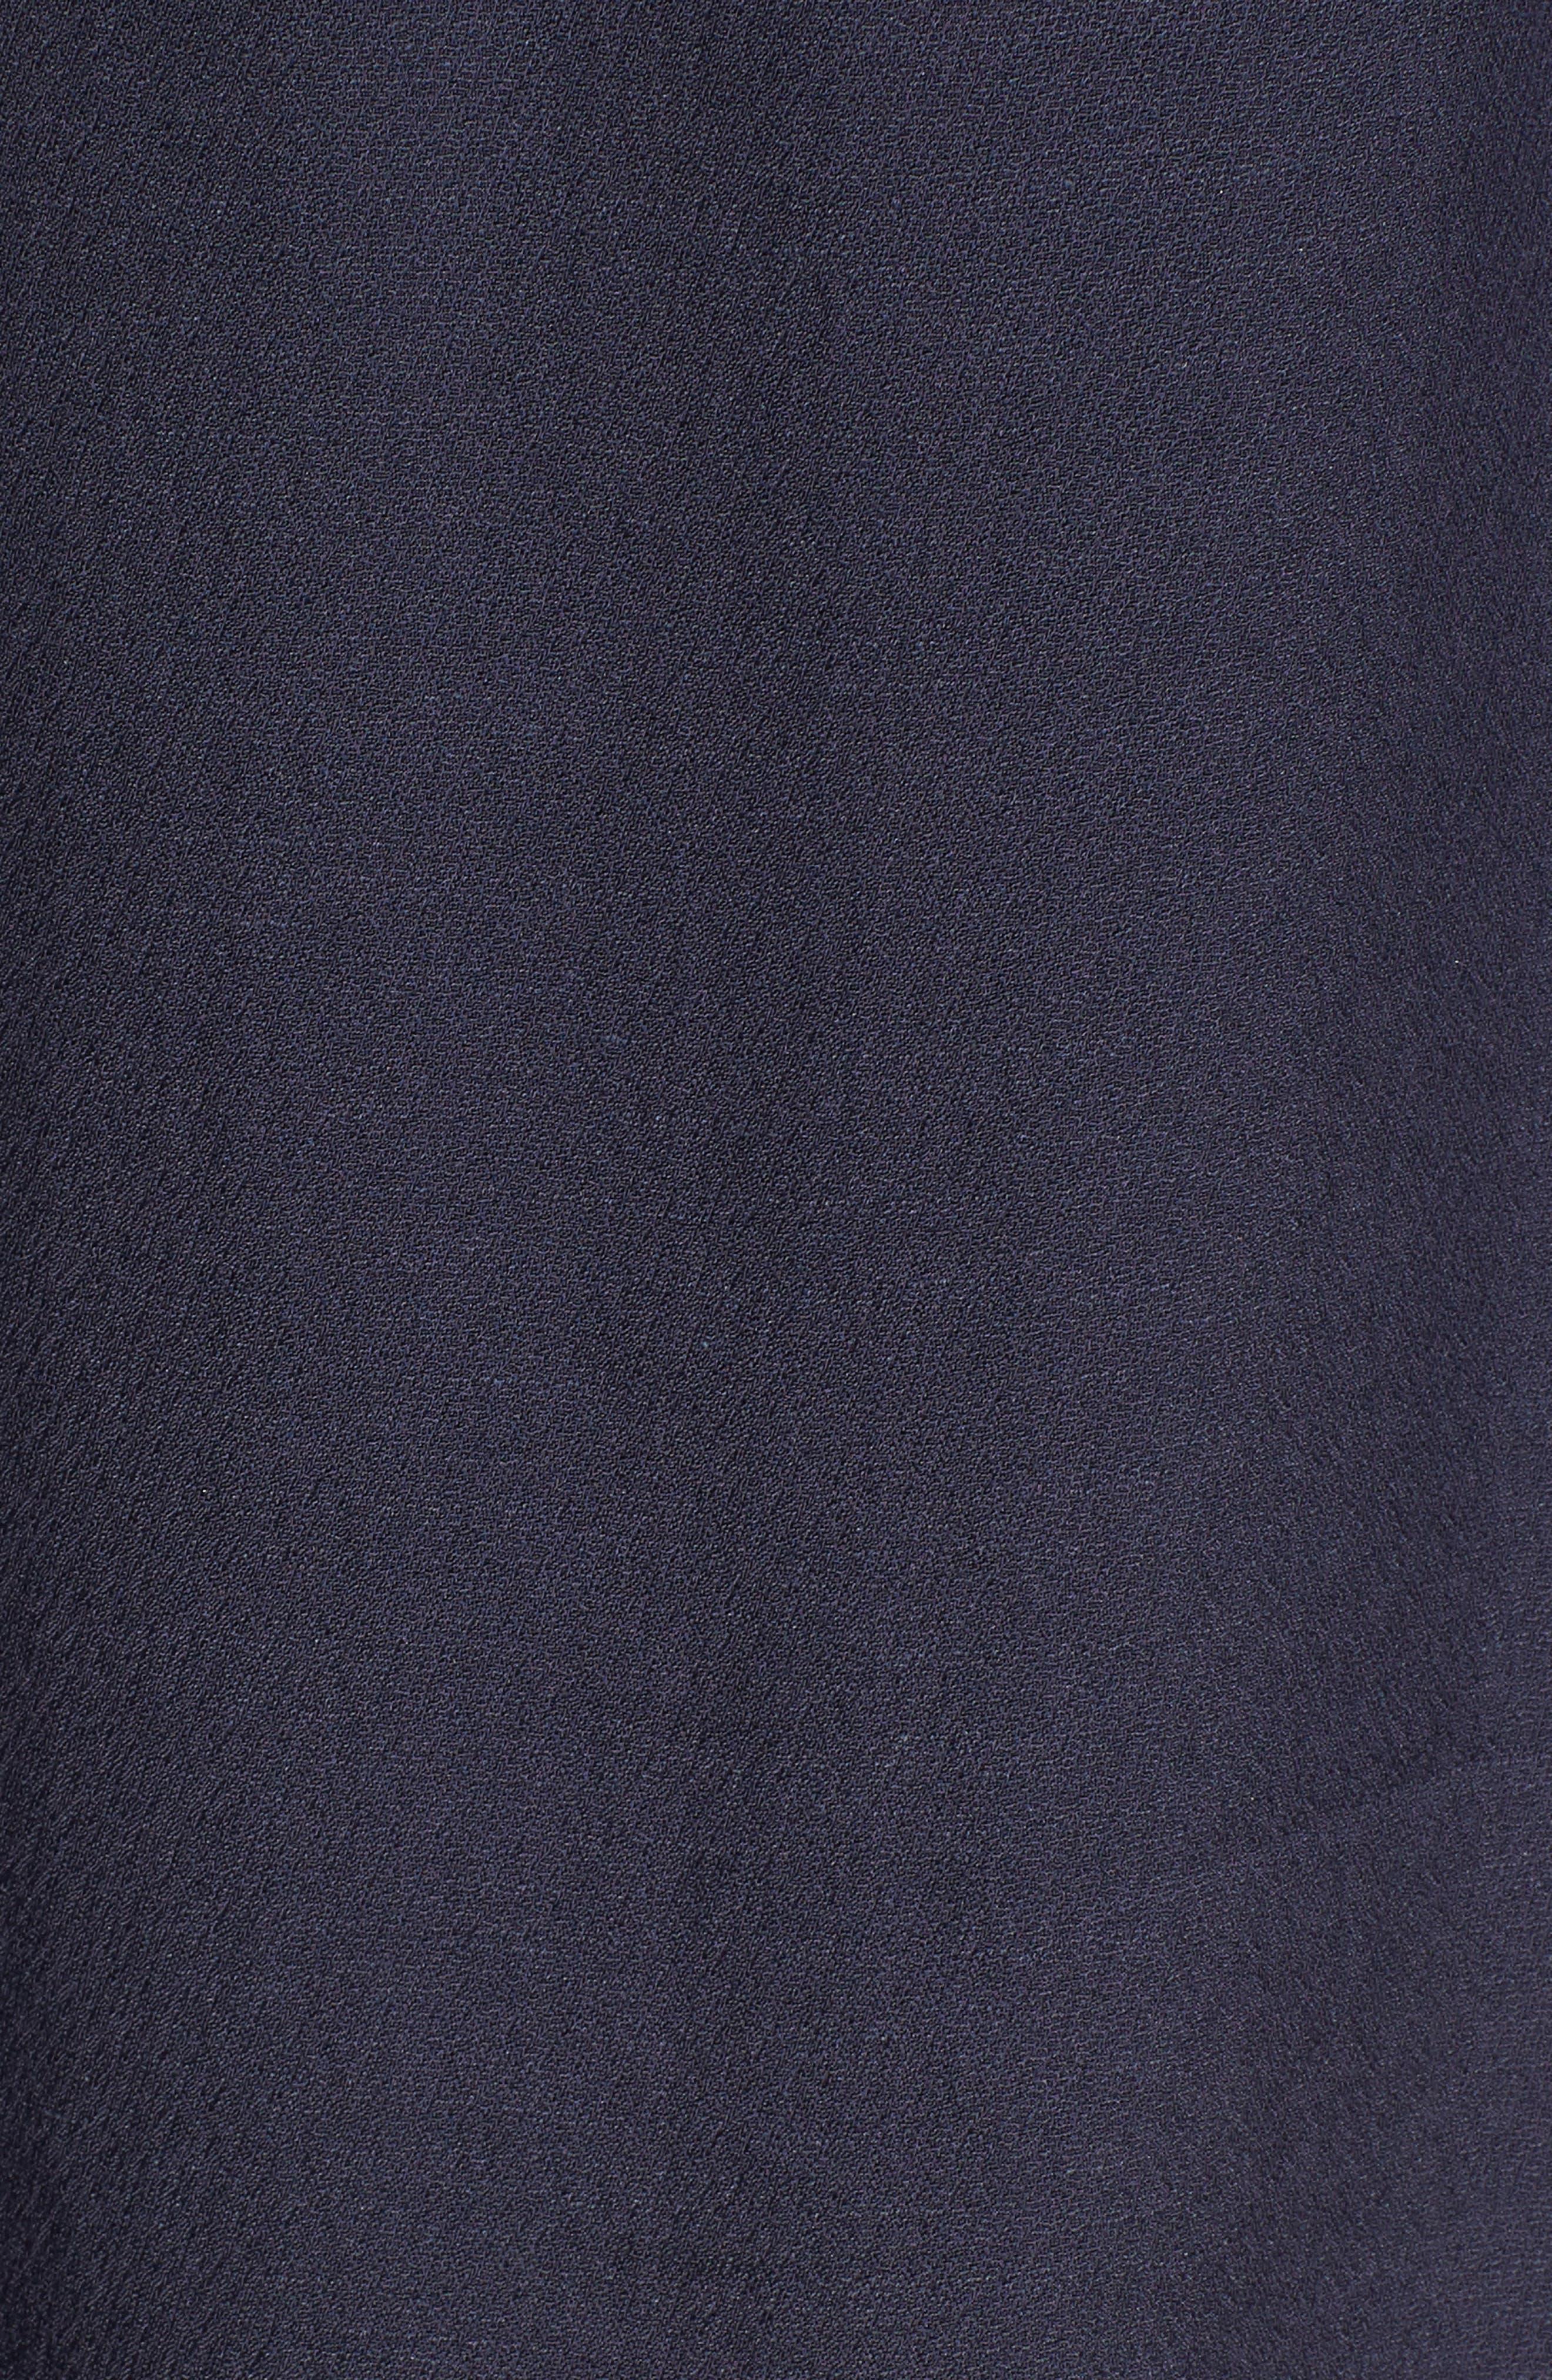 Roxanne Plunge Minidress,                             Alternate thumbnail 5, color,                             410